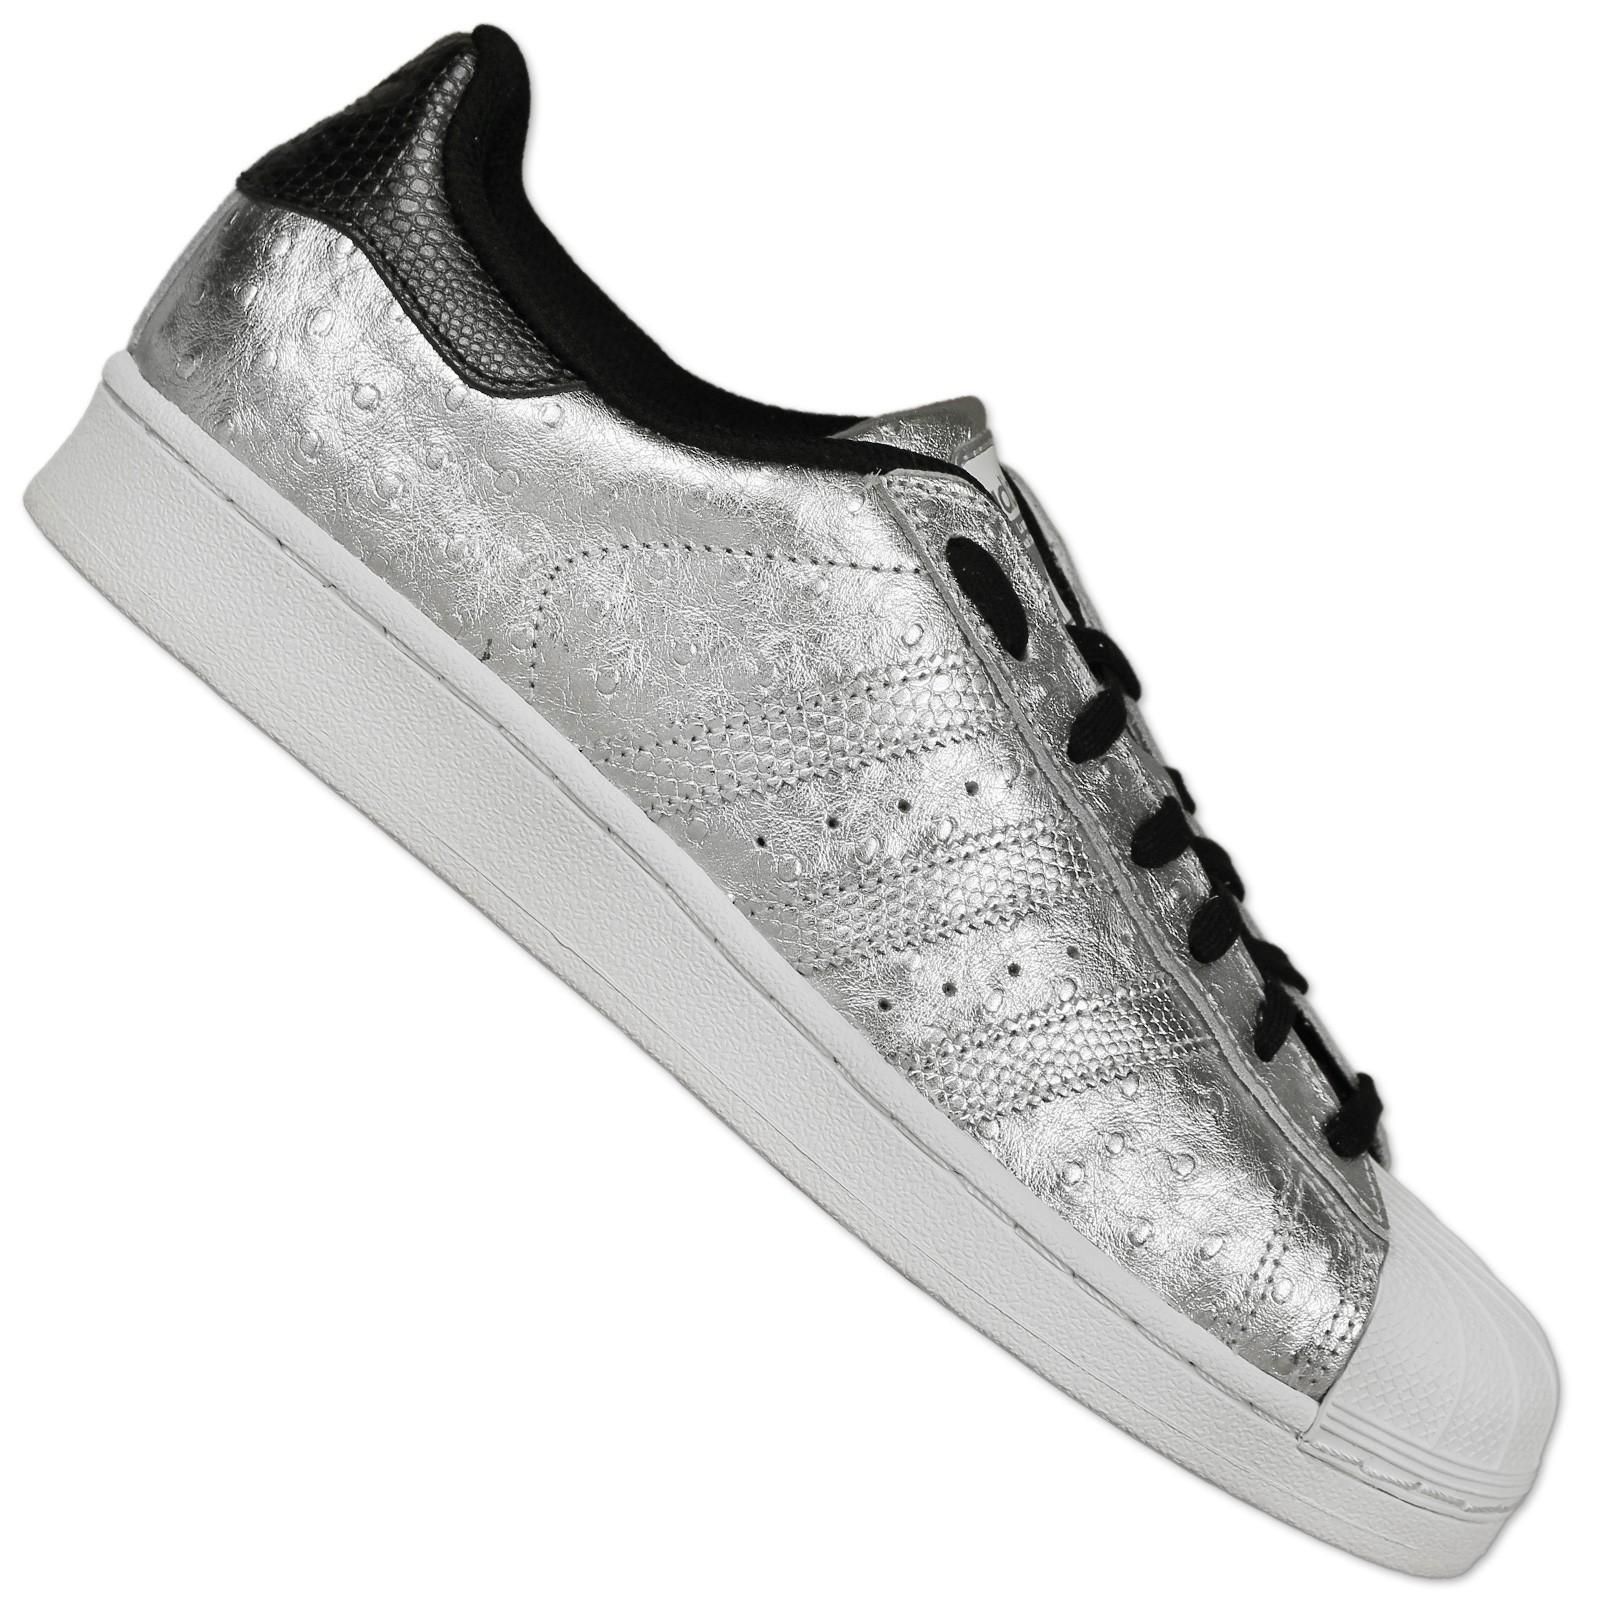 Details about Adidas Originals Superstar